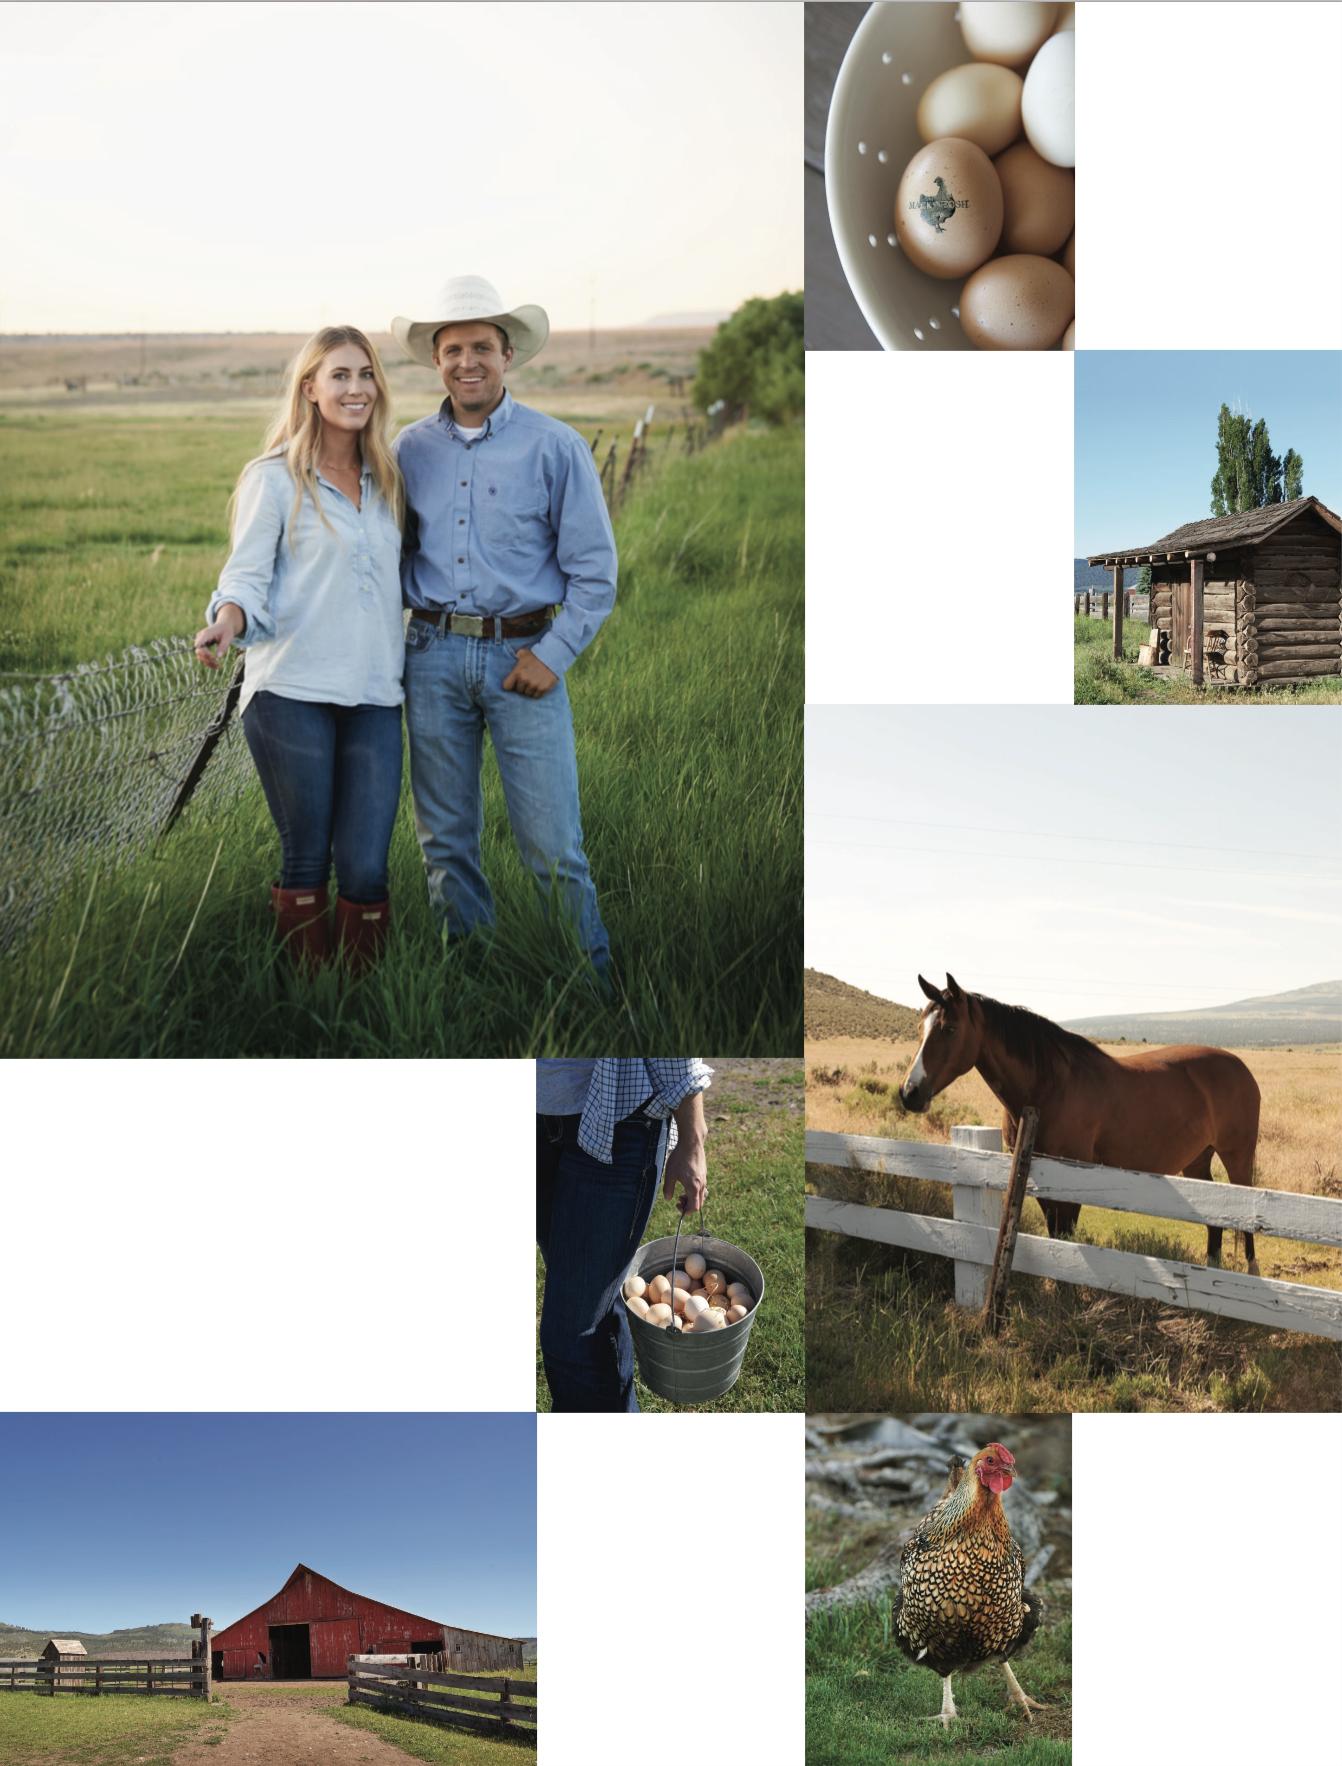 Life+on+the+farm+|+boxwoodavenue.com copy.jpg